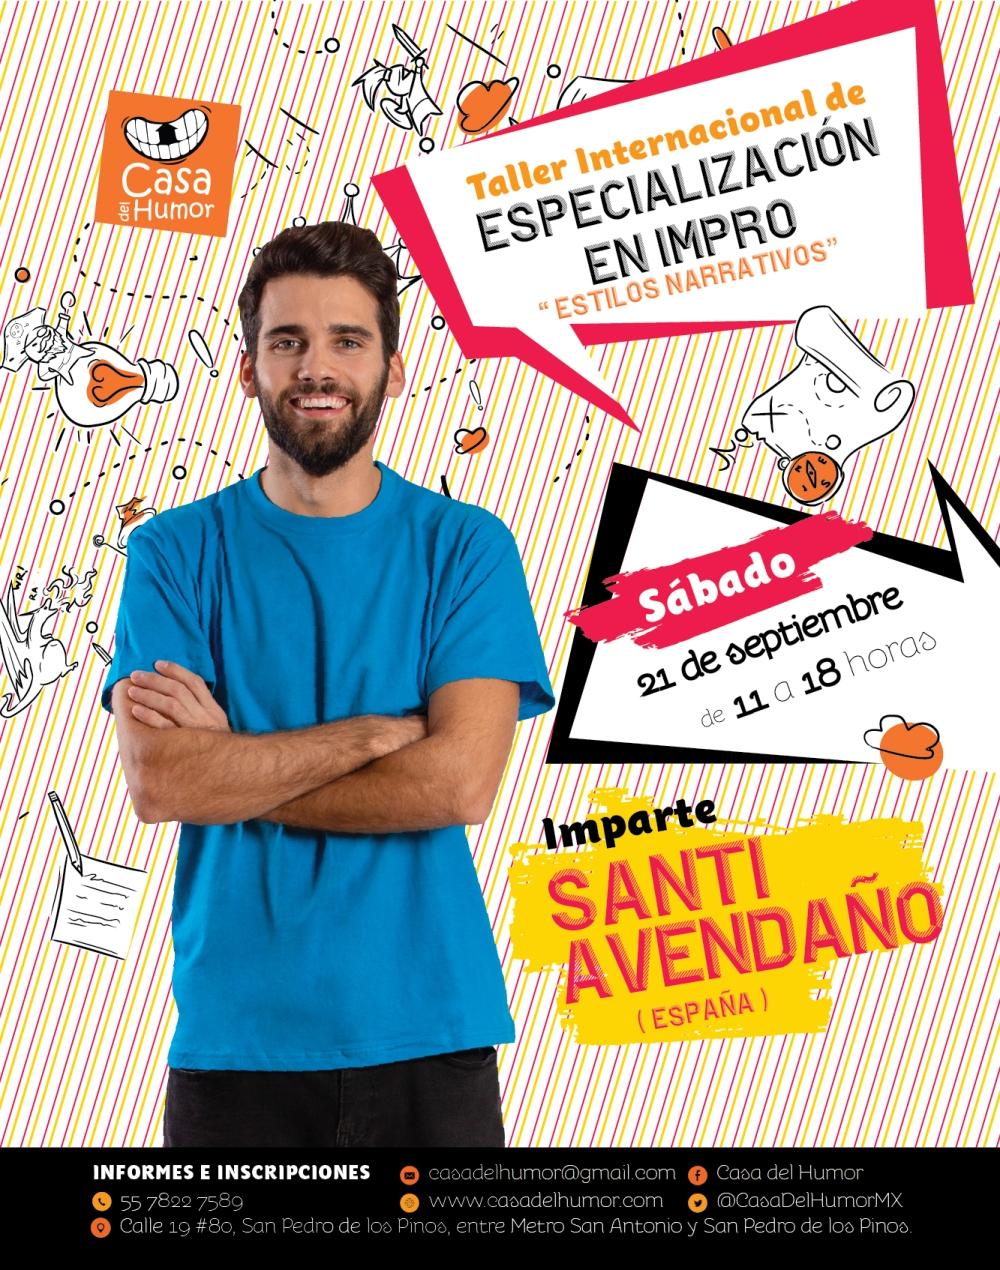 Casa_del_humor_especializacion_impro_santi_avendaño-01